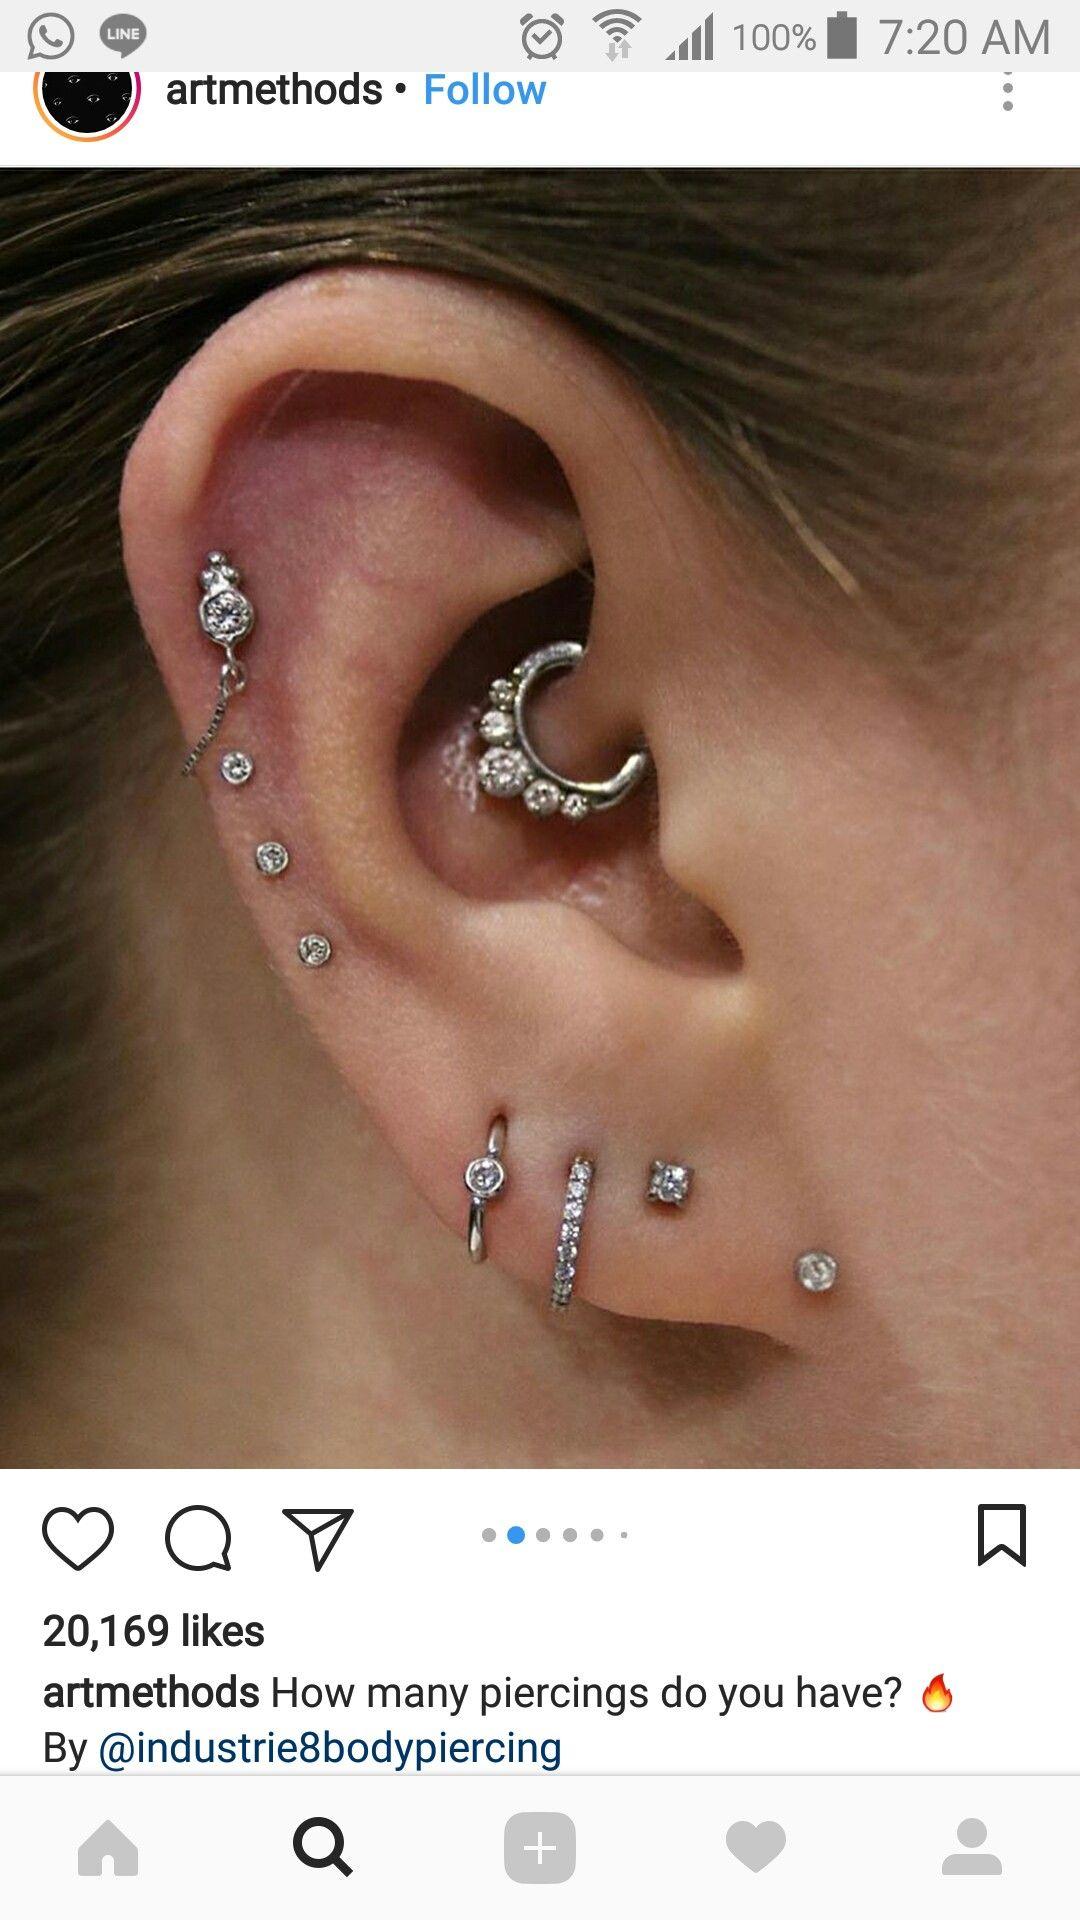 Nose piercing hoop vs stud  Pin by Cassandra Rionna Baer on Piercings  Pinterest  Piercings